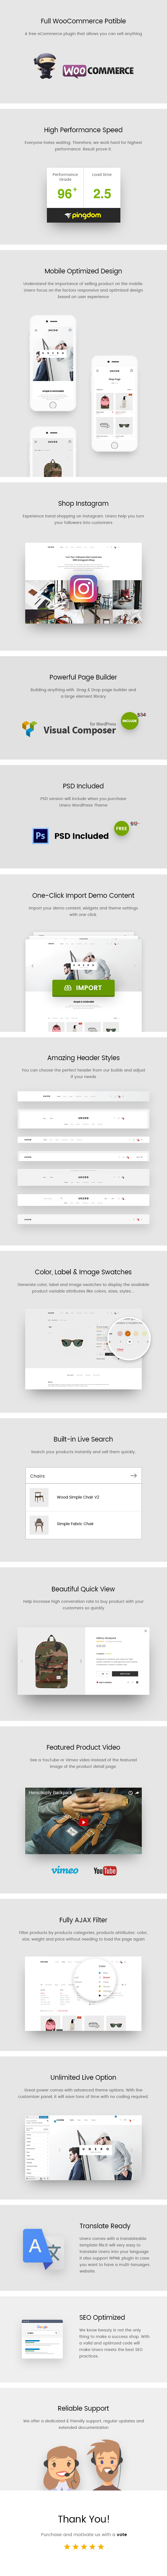 h5ag4nC - Unero - Minimalist AJAX WooCommerce WordPress Theme